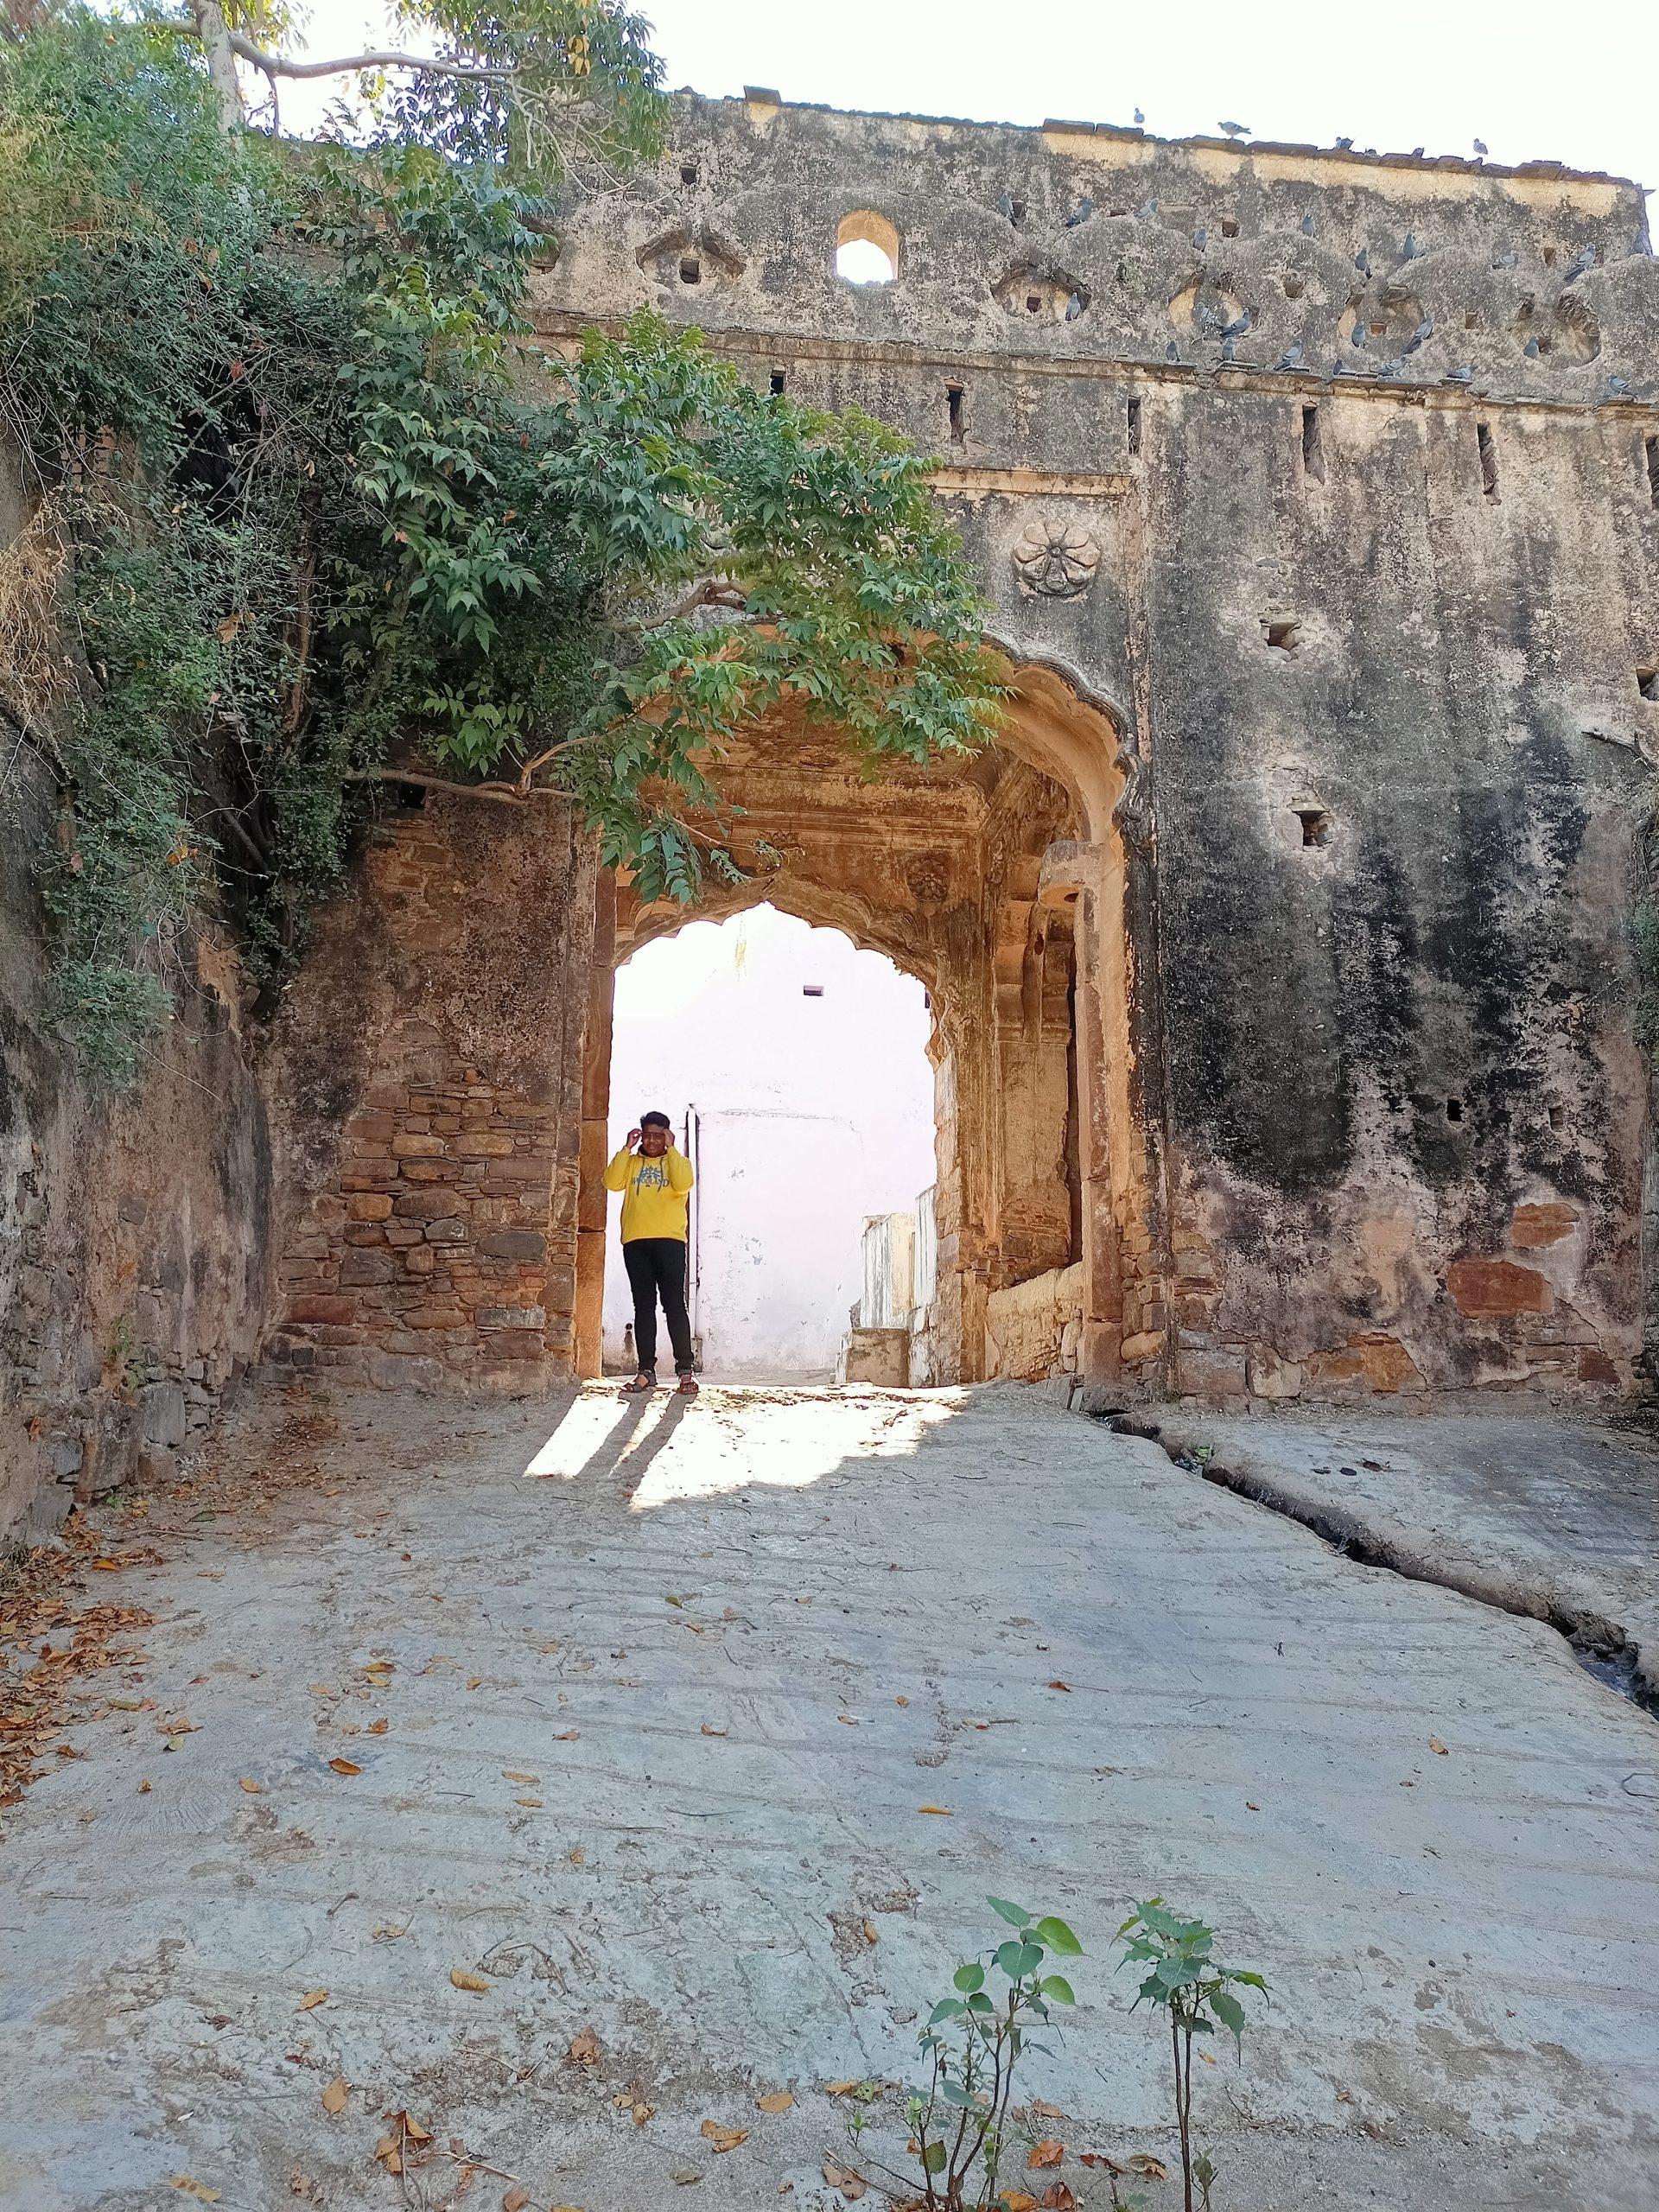 An historic gate